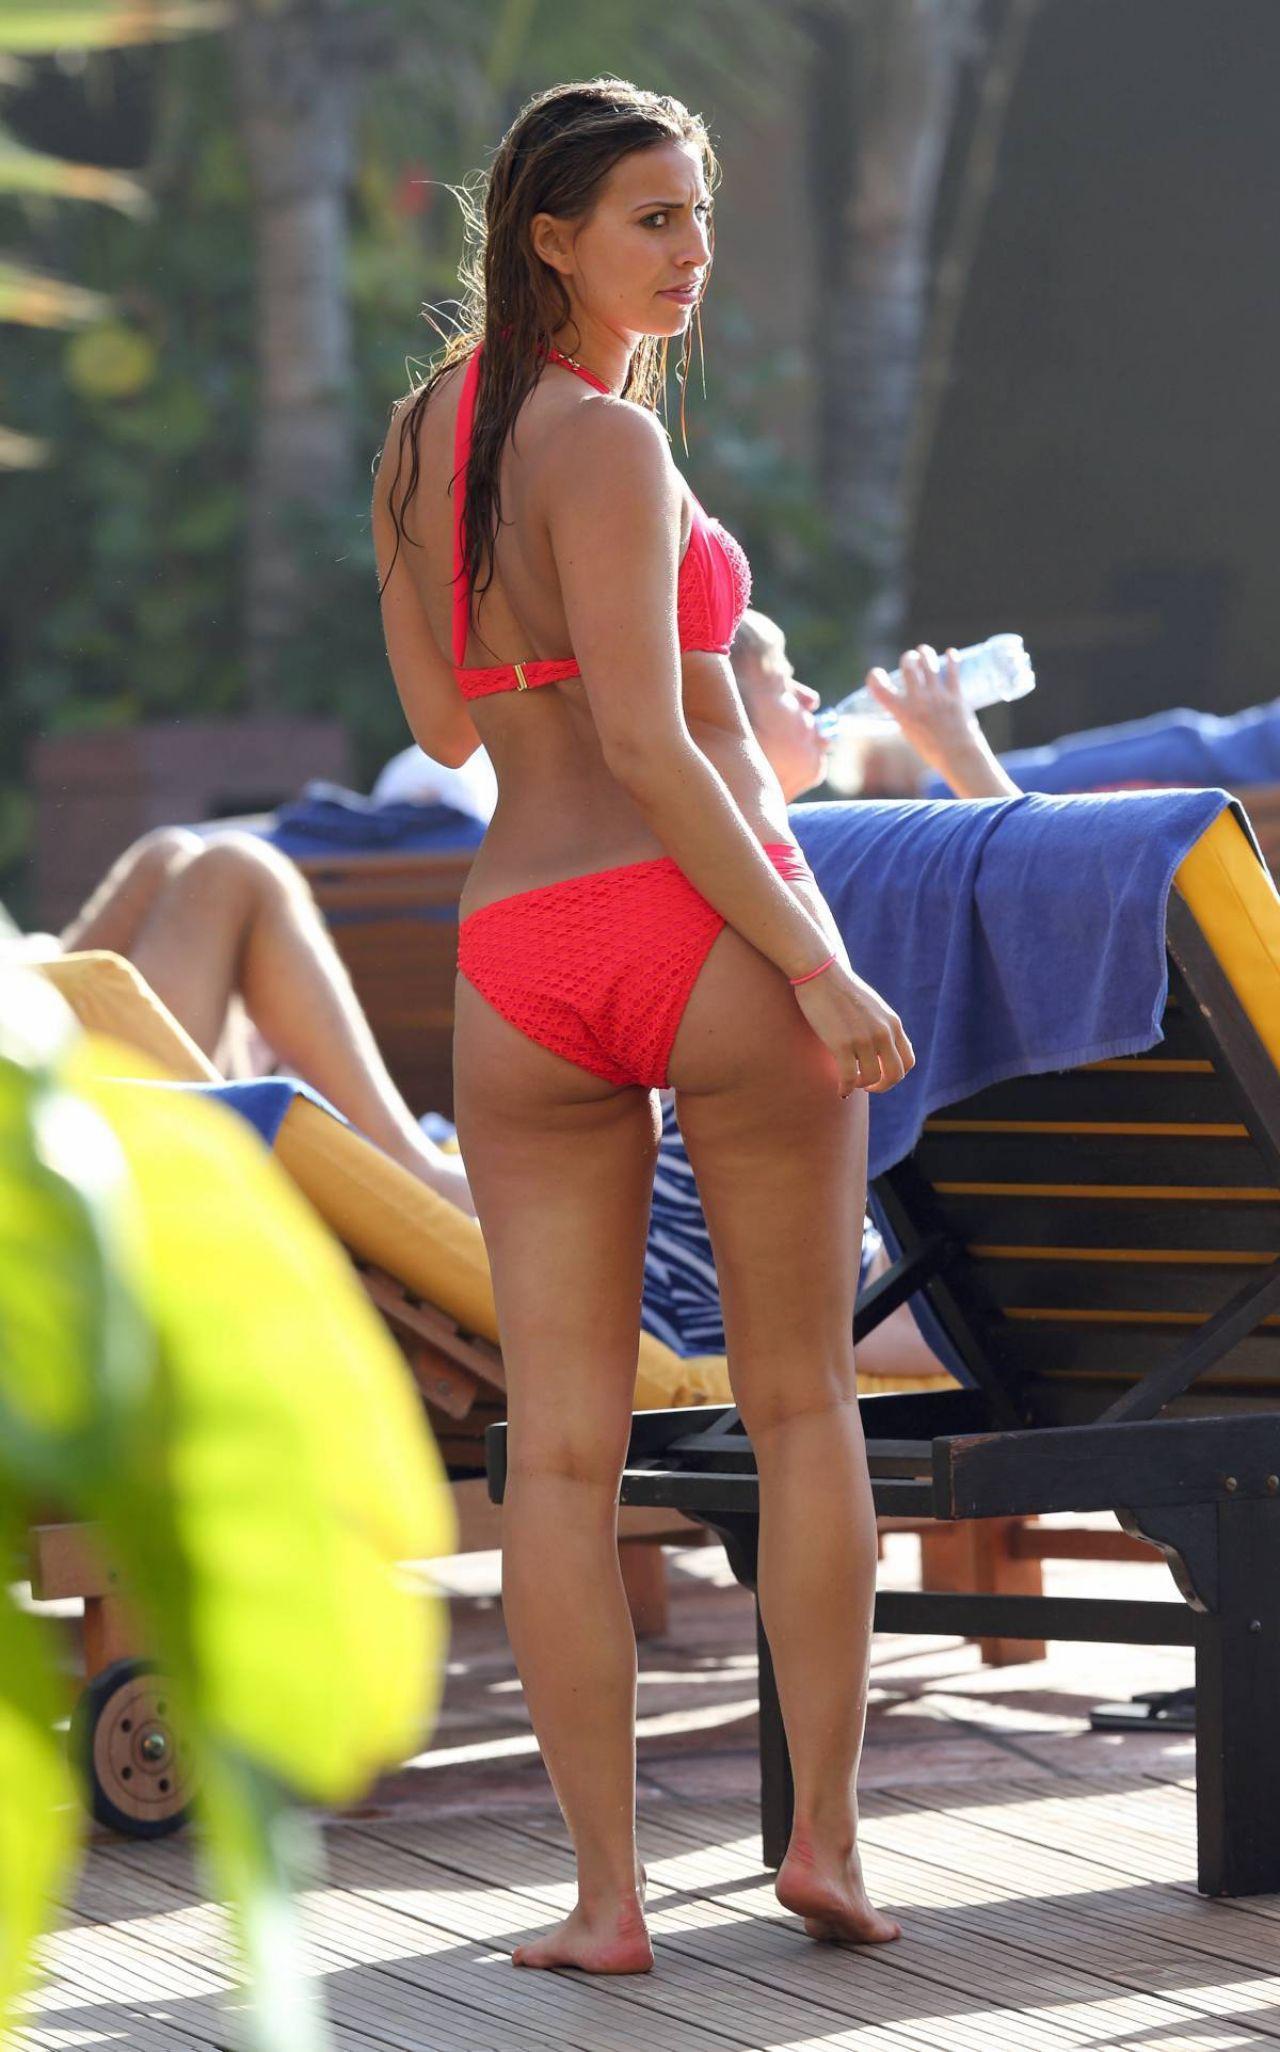 Ferne McCann Bikini Candids - at Poolside of the Hotel in Spain, January 2014